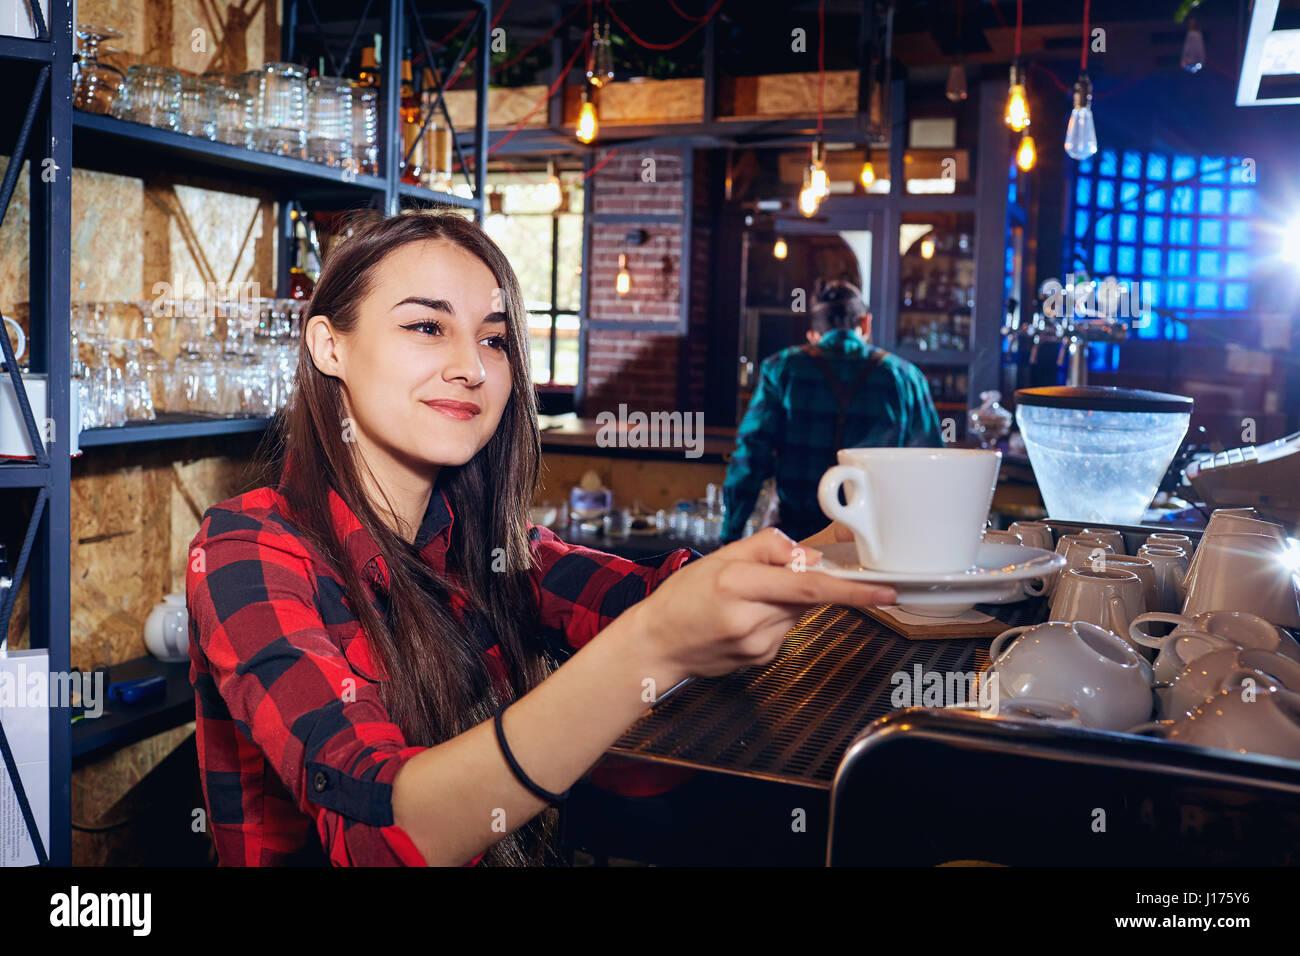 Barmann Mädchen arbeitet an der Bar im Restaurant Stockbild